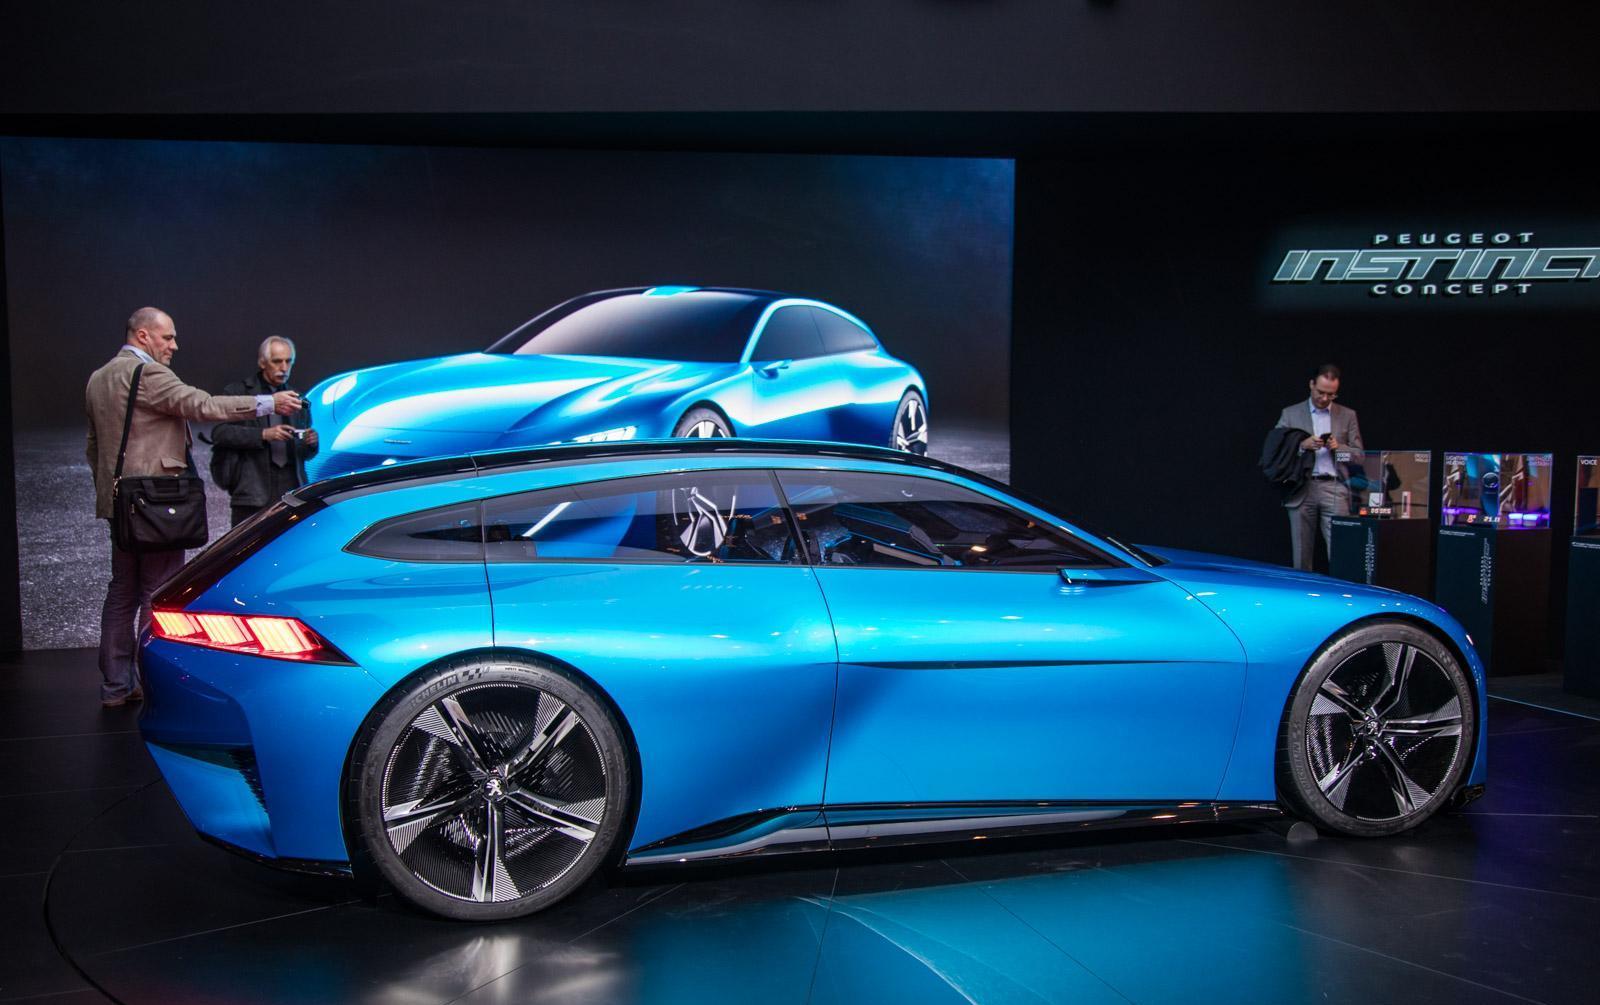 Peugeot-instinct-concept-019